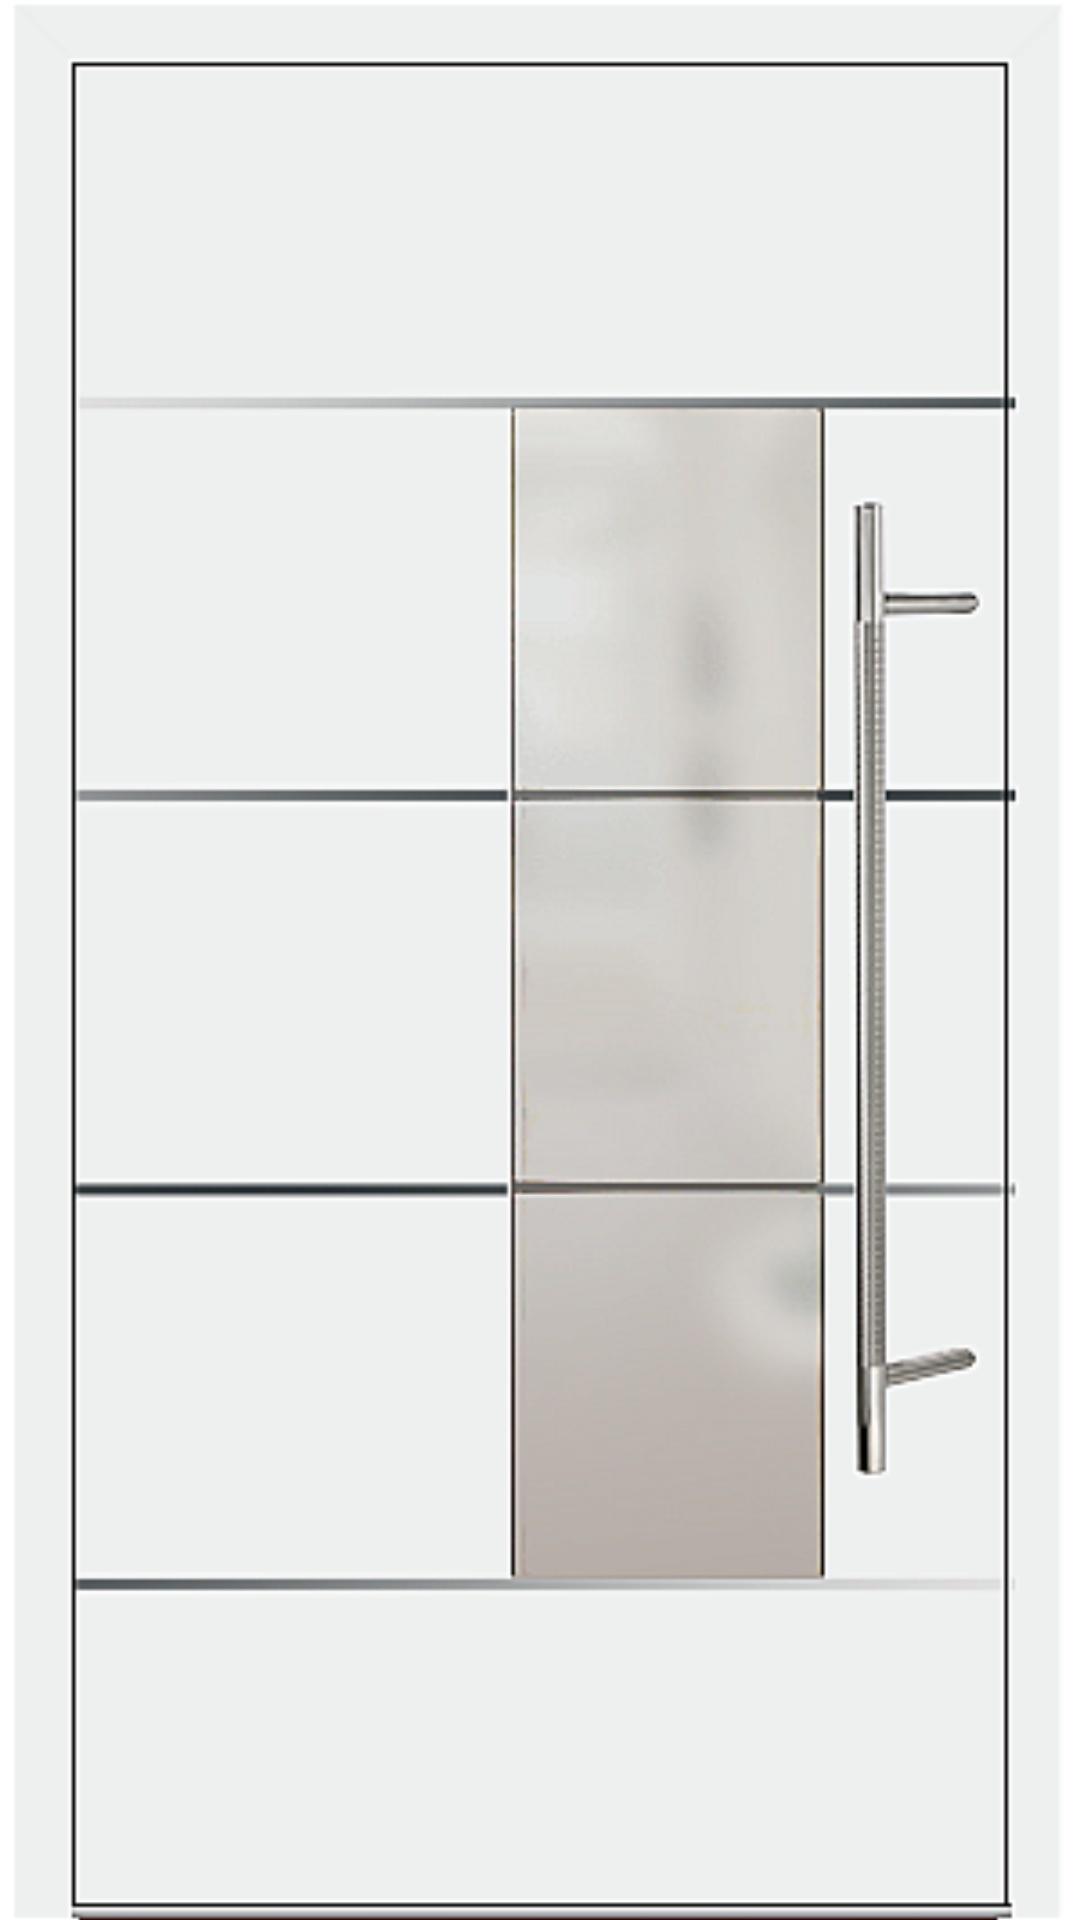 Aluminium Haustür Modell 6878-54 weiß